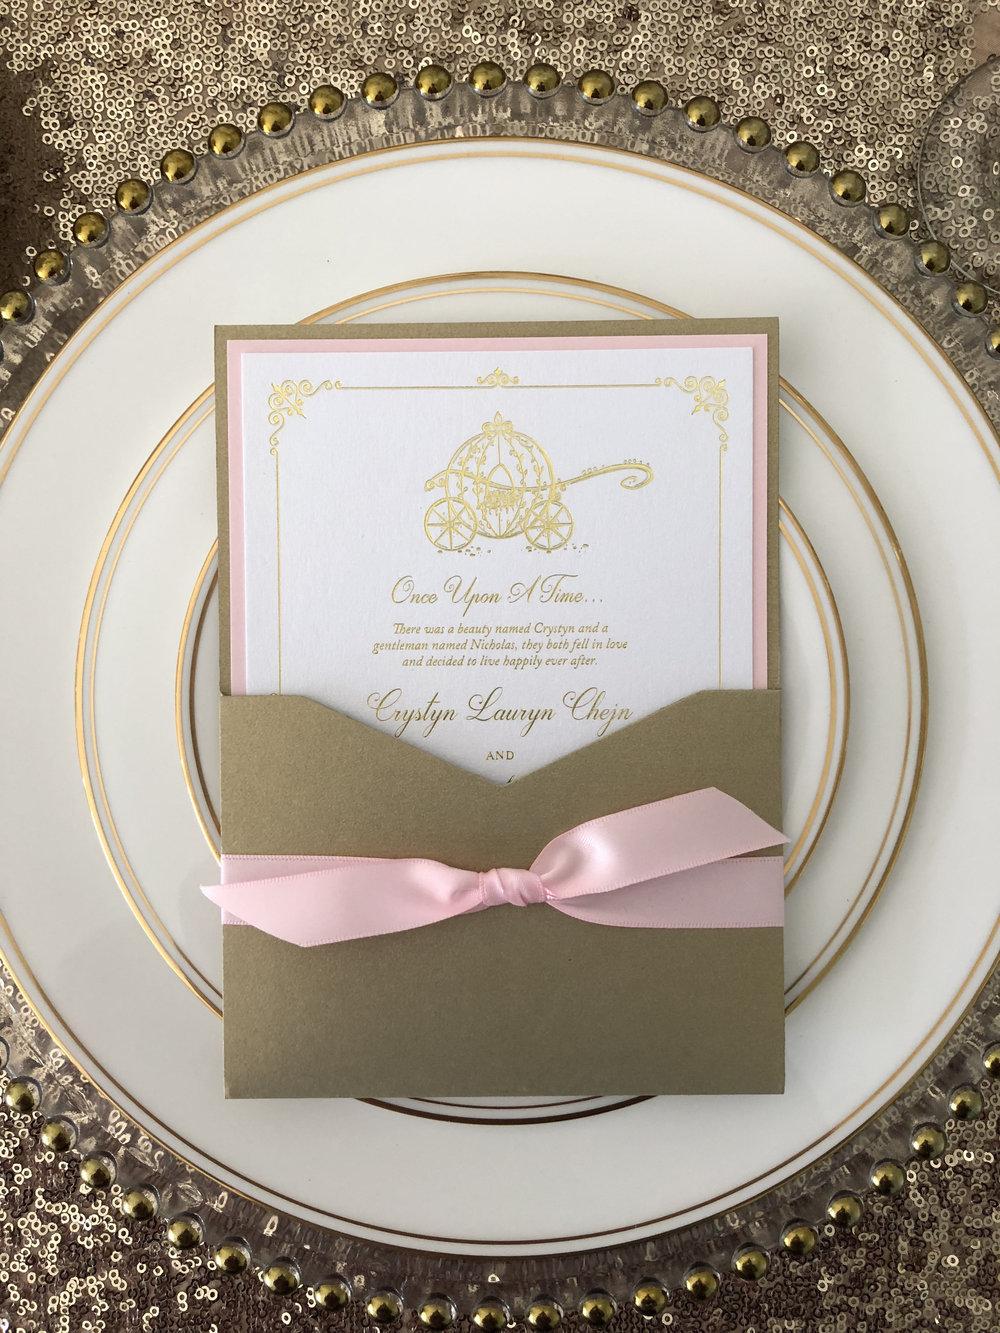 Invitation-Architects-Paris-Cinderalla-Fairtytale-Gold-Foil-Wedding-Invitation-Pocket.jpg